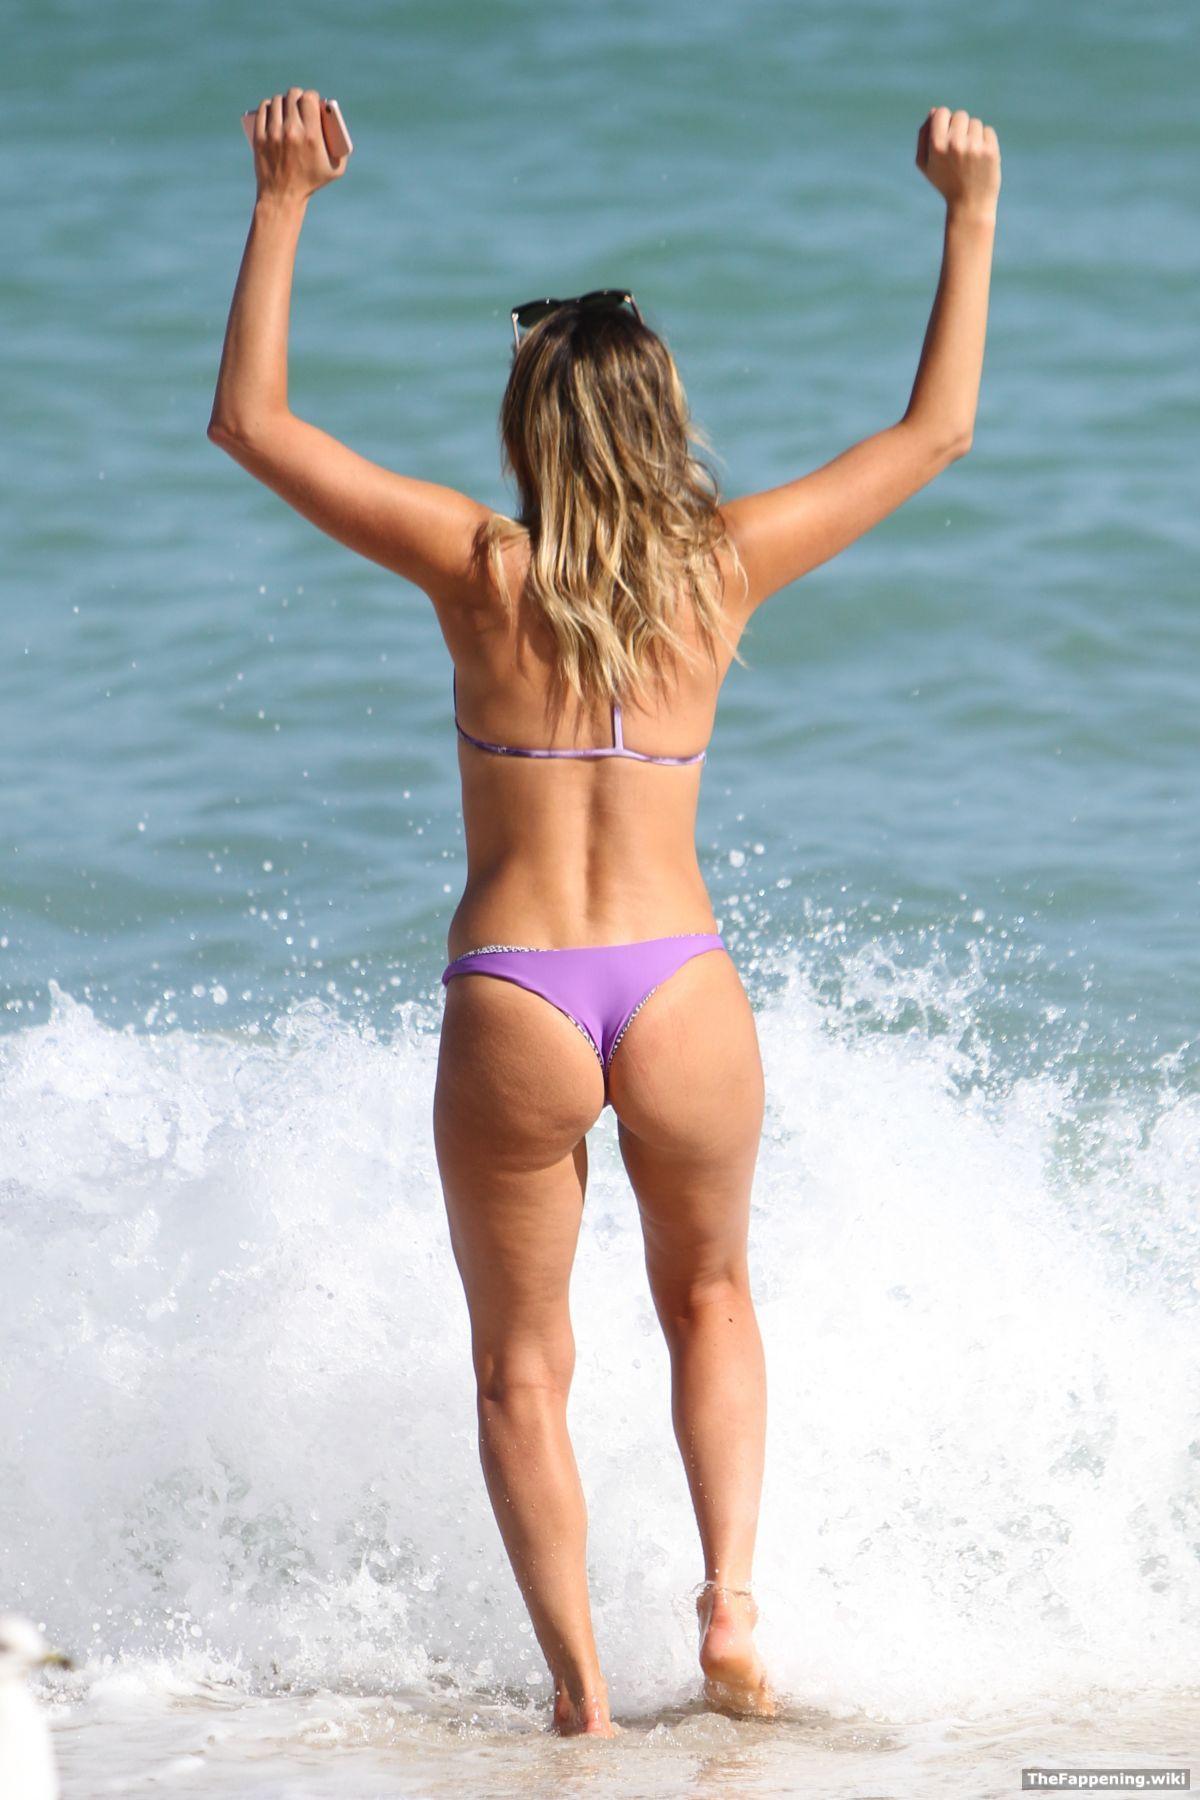 Anastasia Nude anastasia ashley nude pics & vids - the fappening